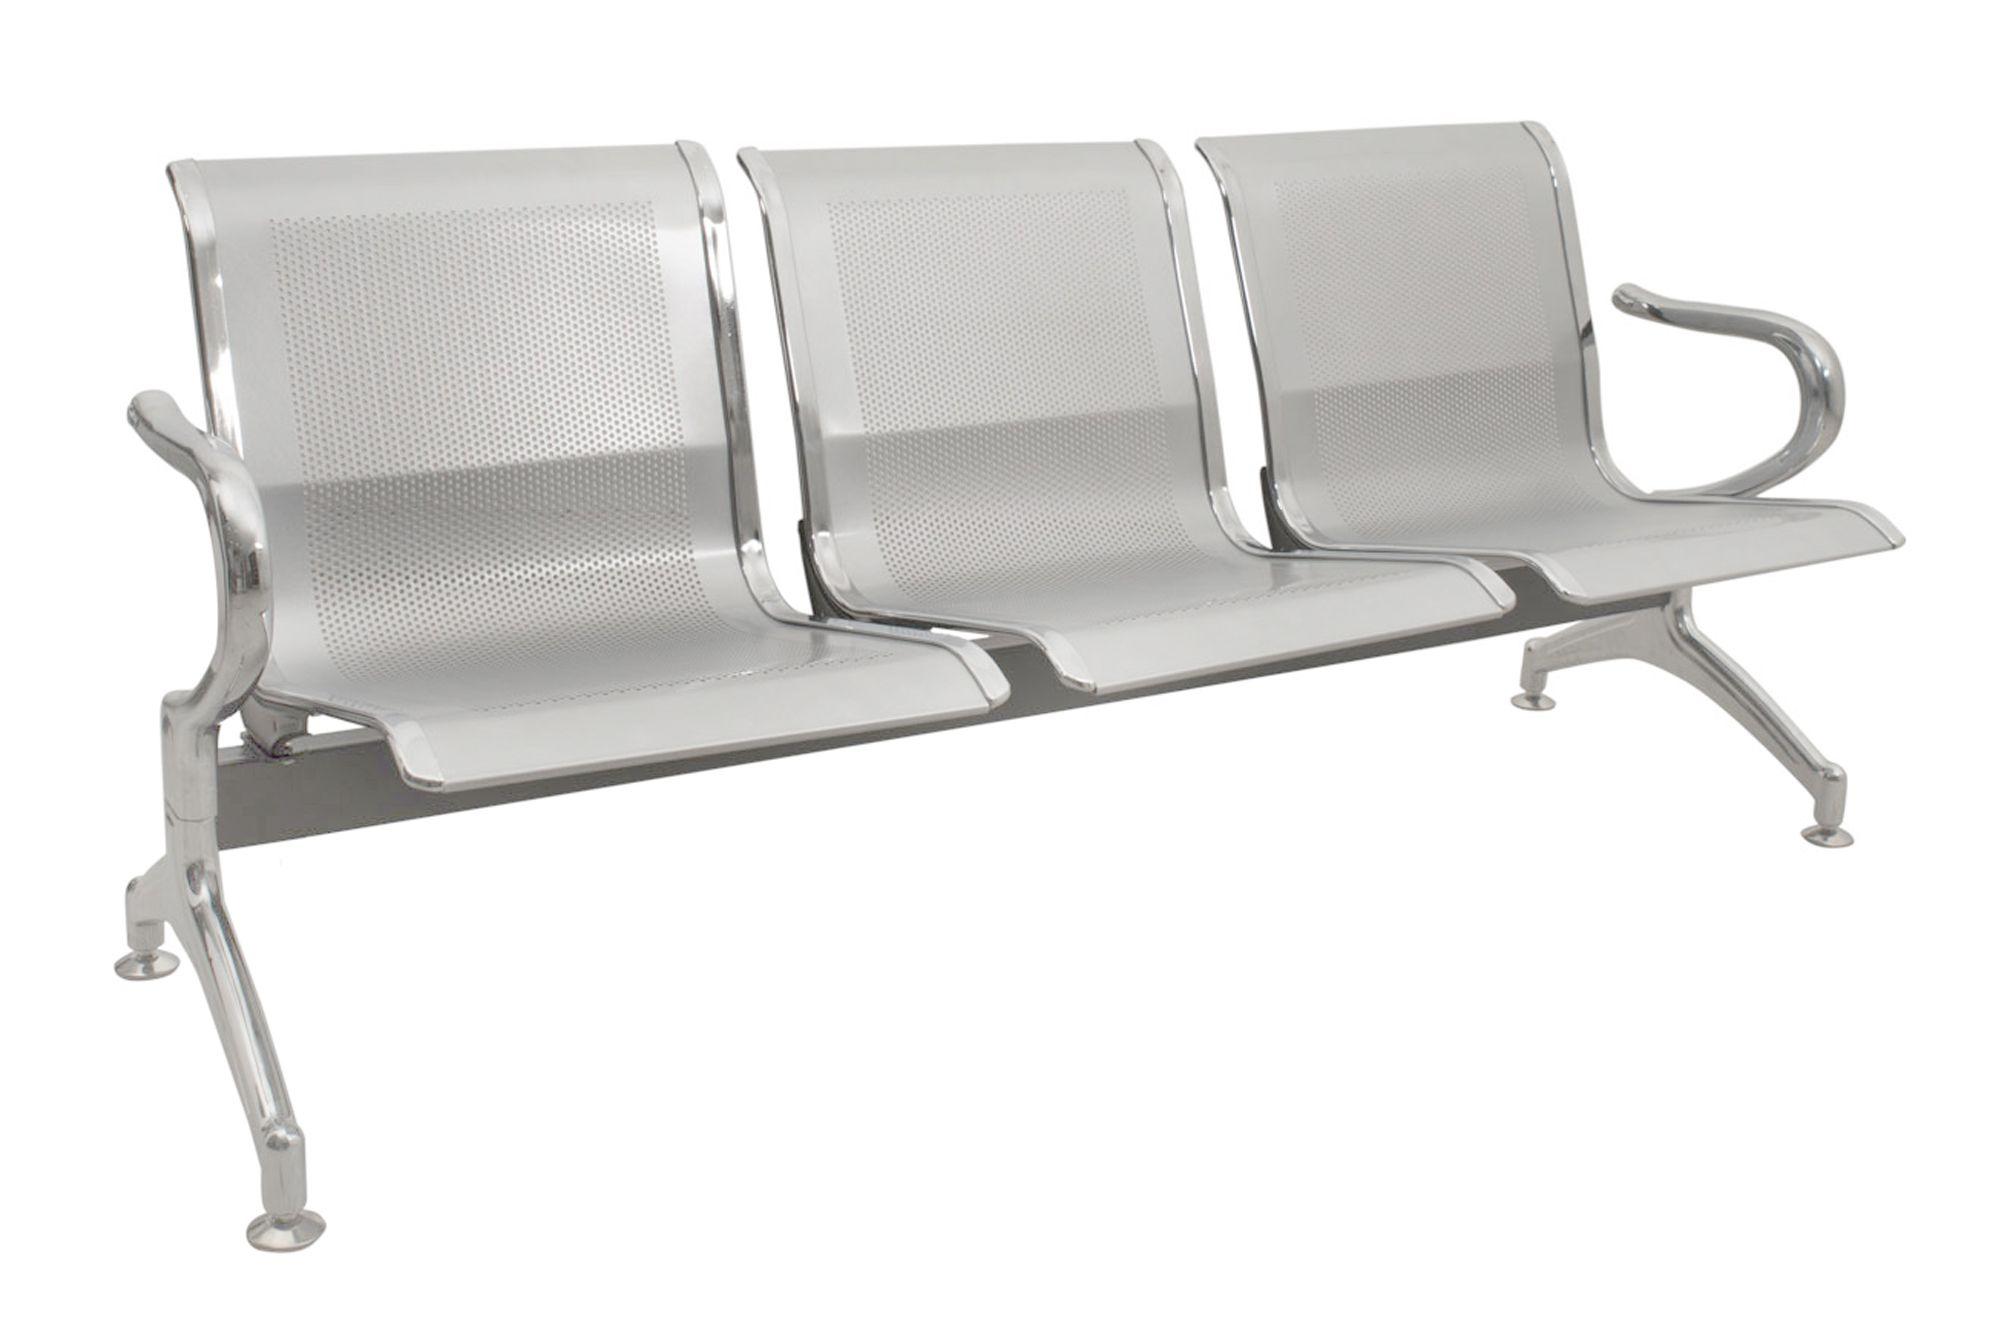 Xavoy fice Steel Sofa Pair Buy 1 Get 1 Free Buy Xavoy fice